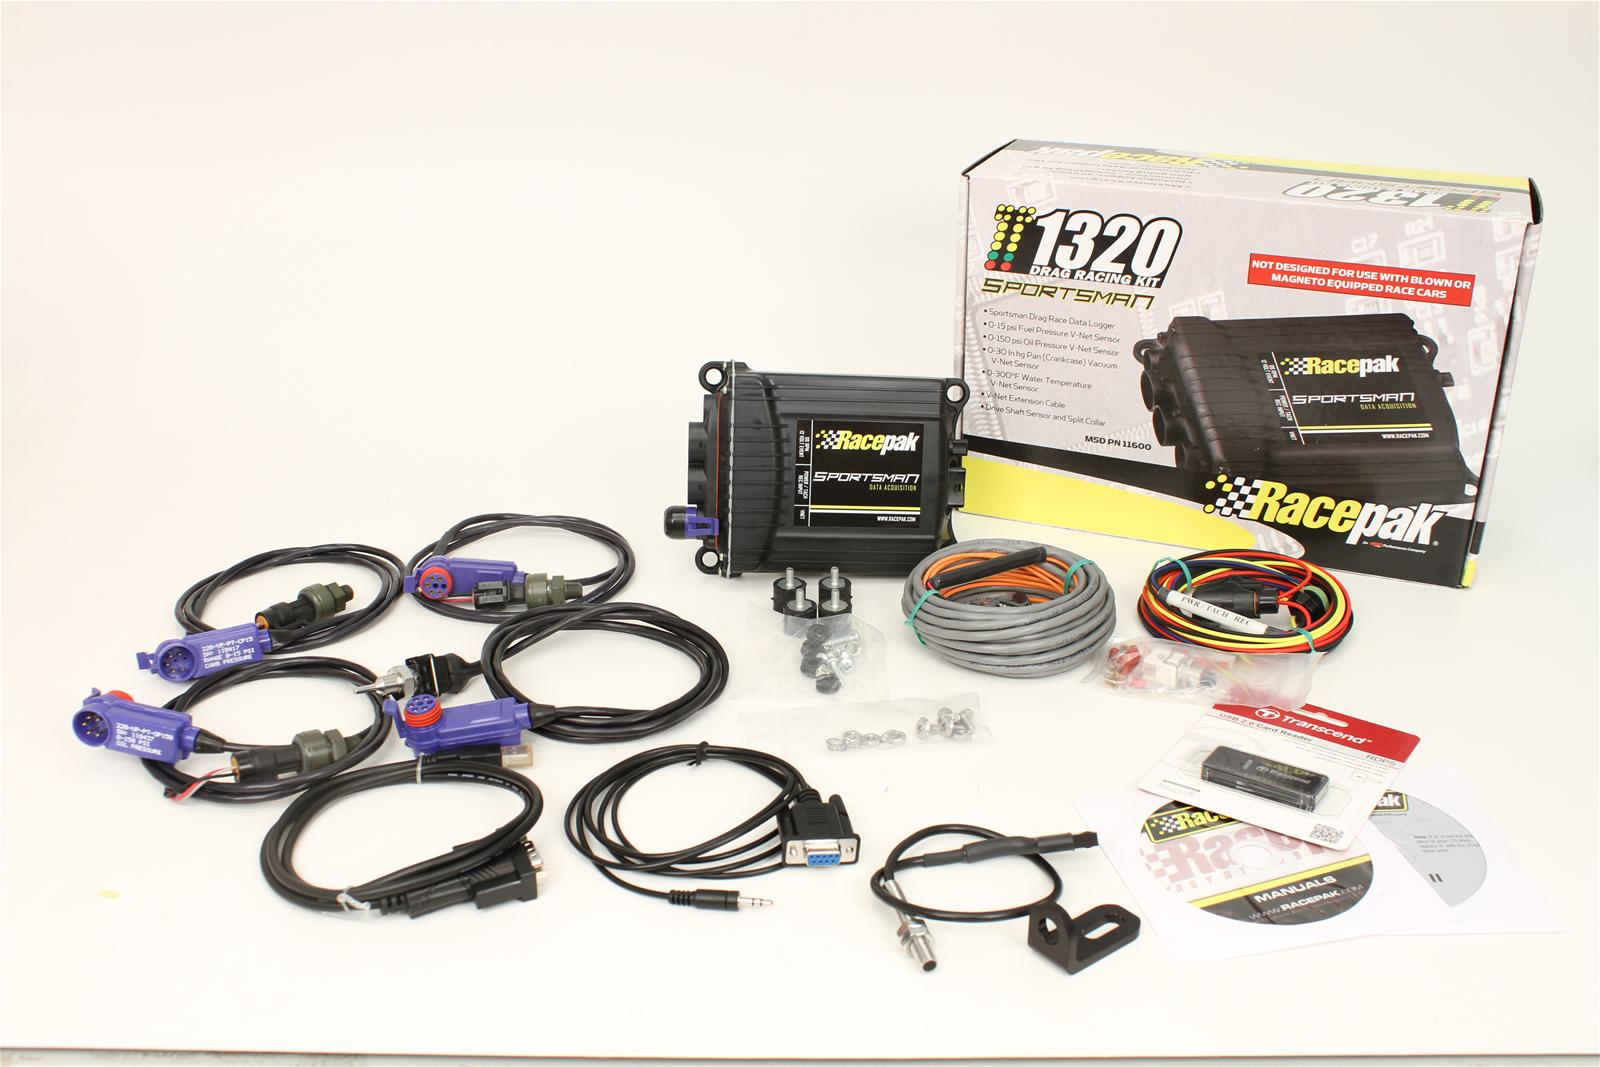 msd racepak sportsman data logger kits 11600 free shipping on orders 99 at summit racing